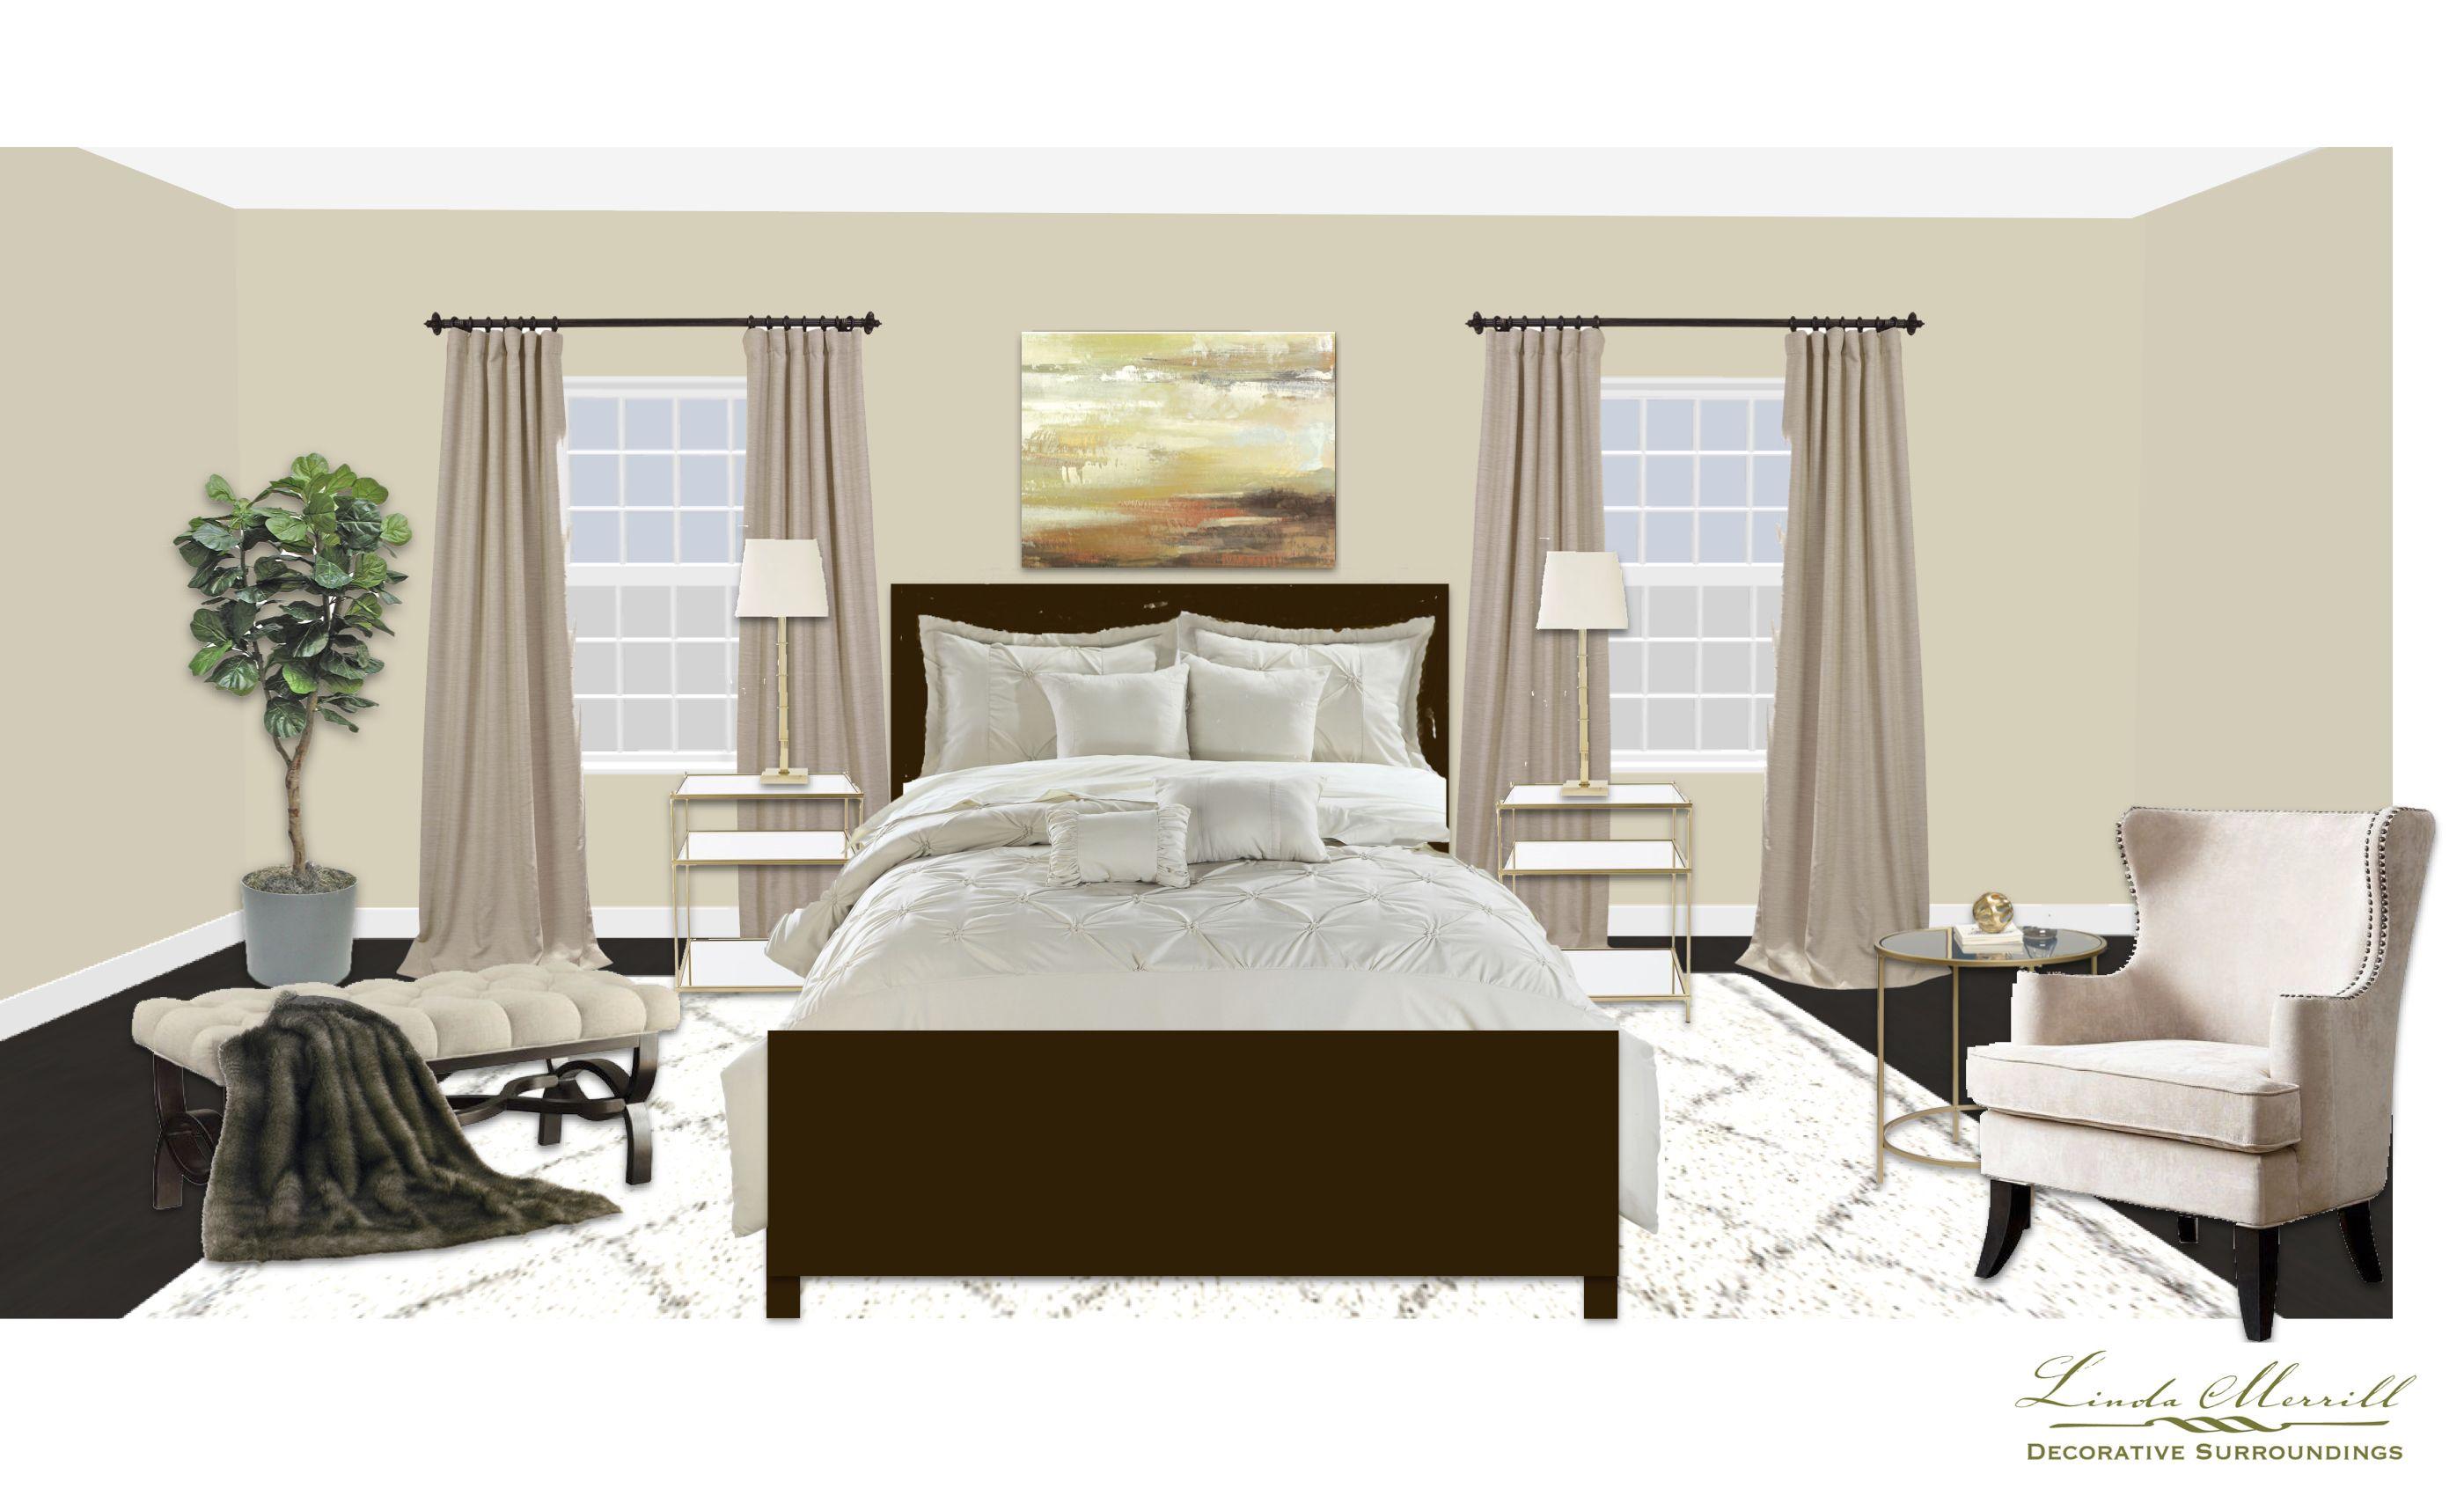 Virtual Design Interior Design Decoration Services Interior